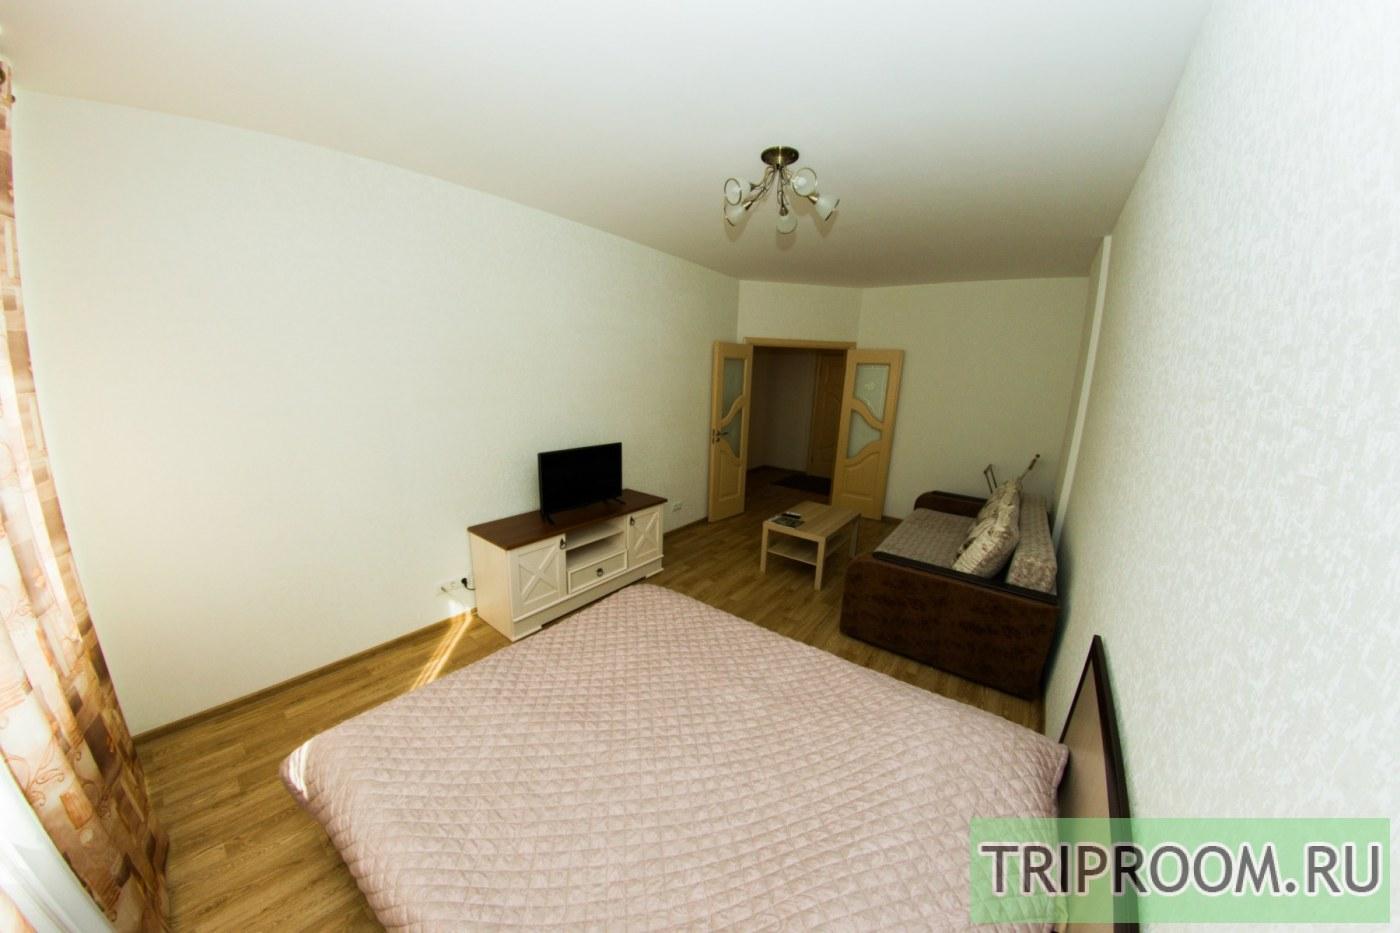 1-комнатная квартира посуточно (вариант № 39814), ул. Ленинский проспект, фото № 5